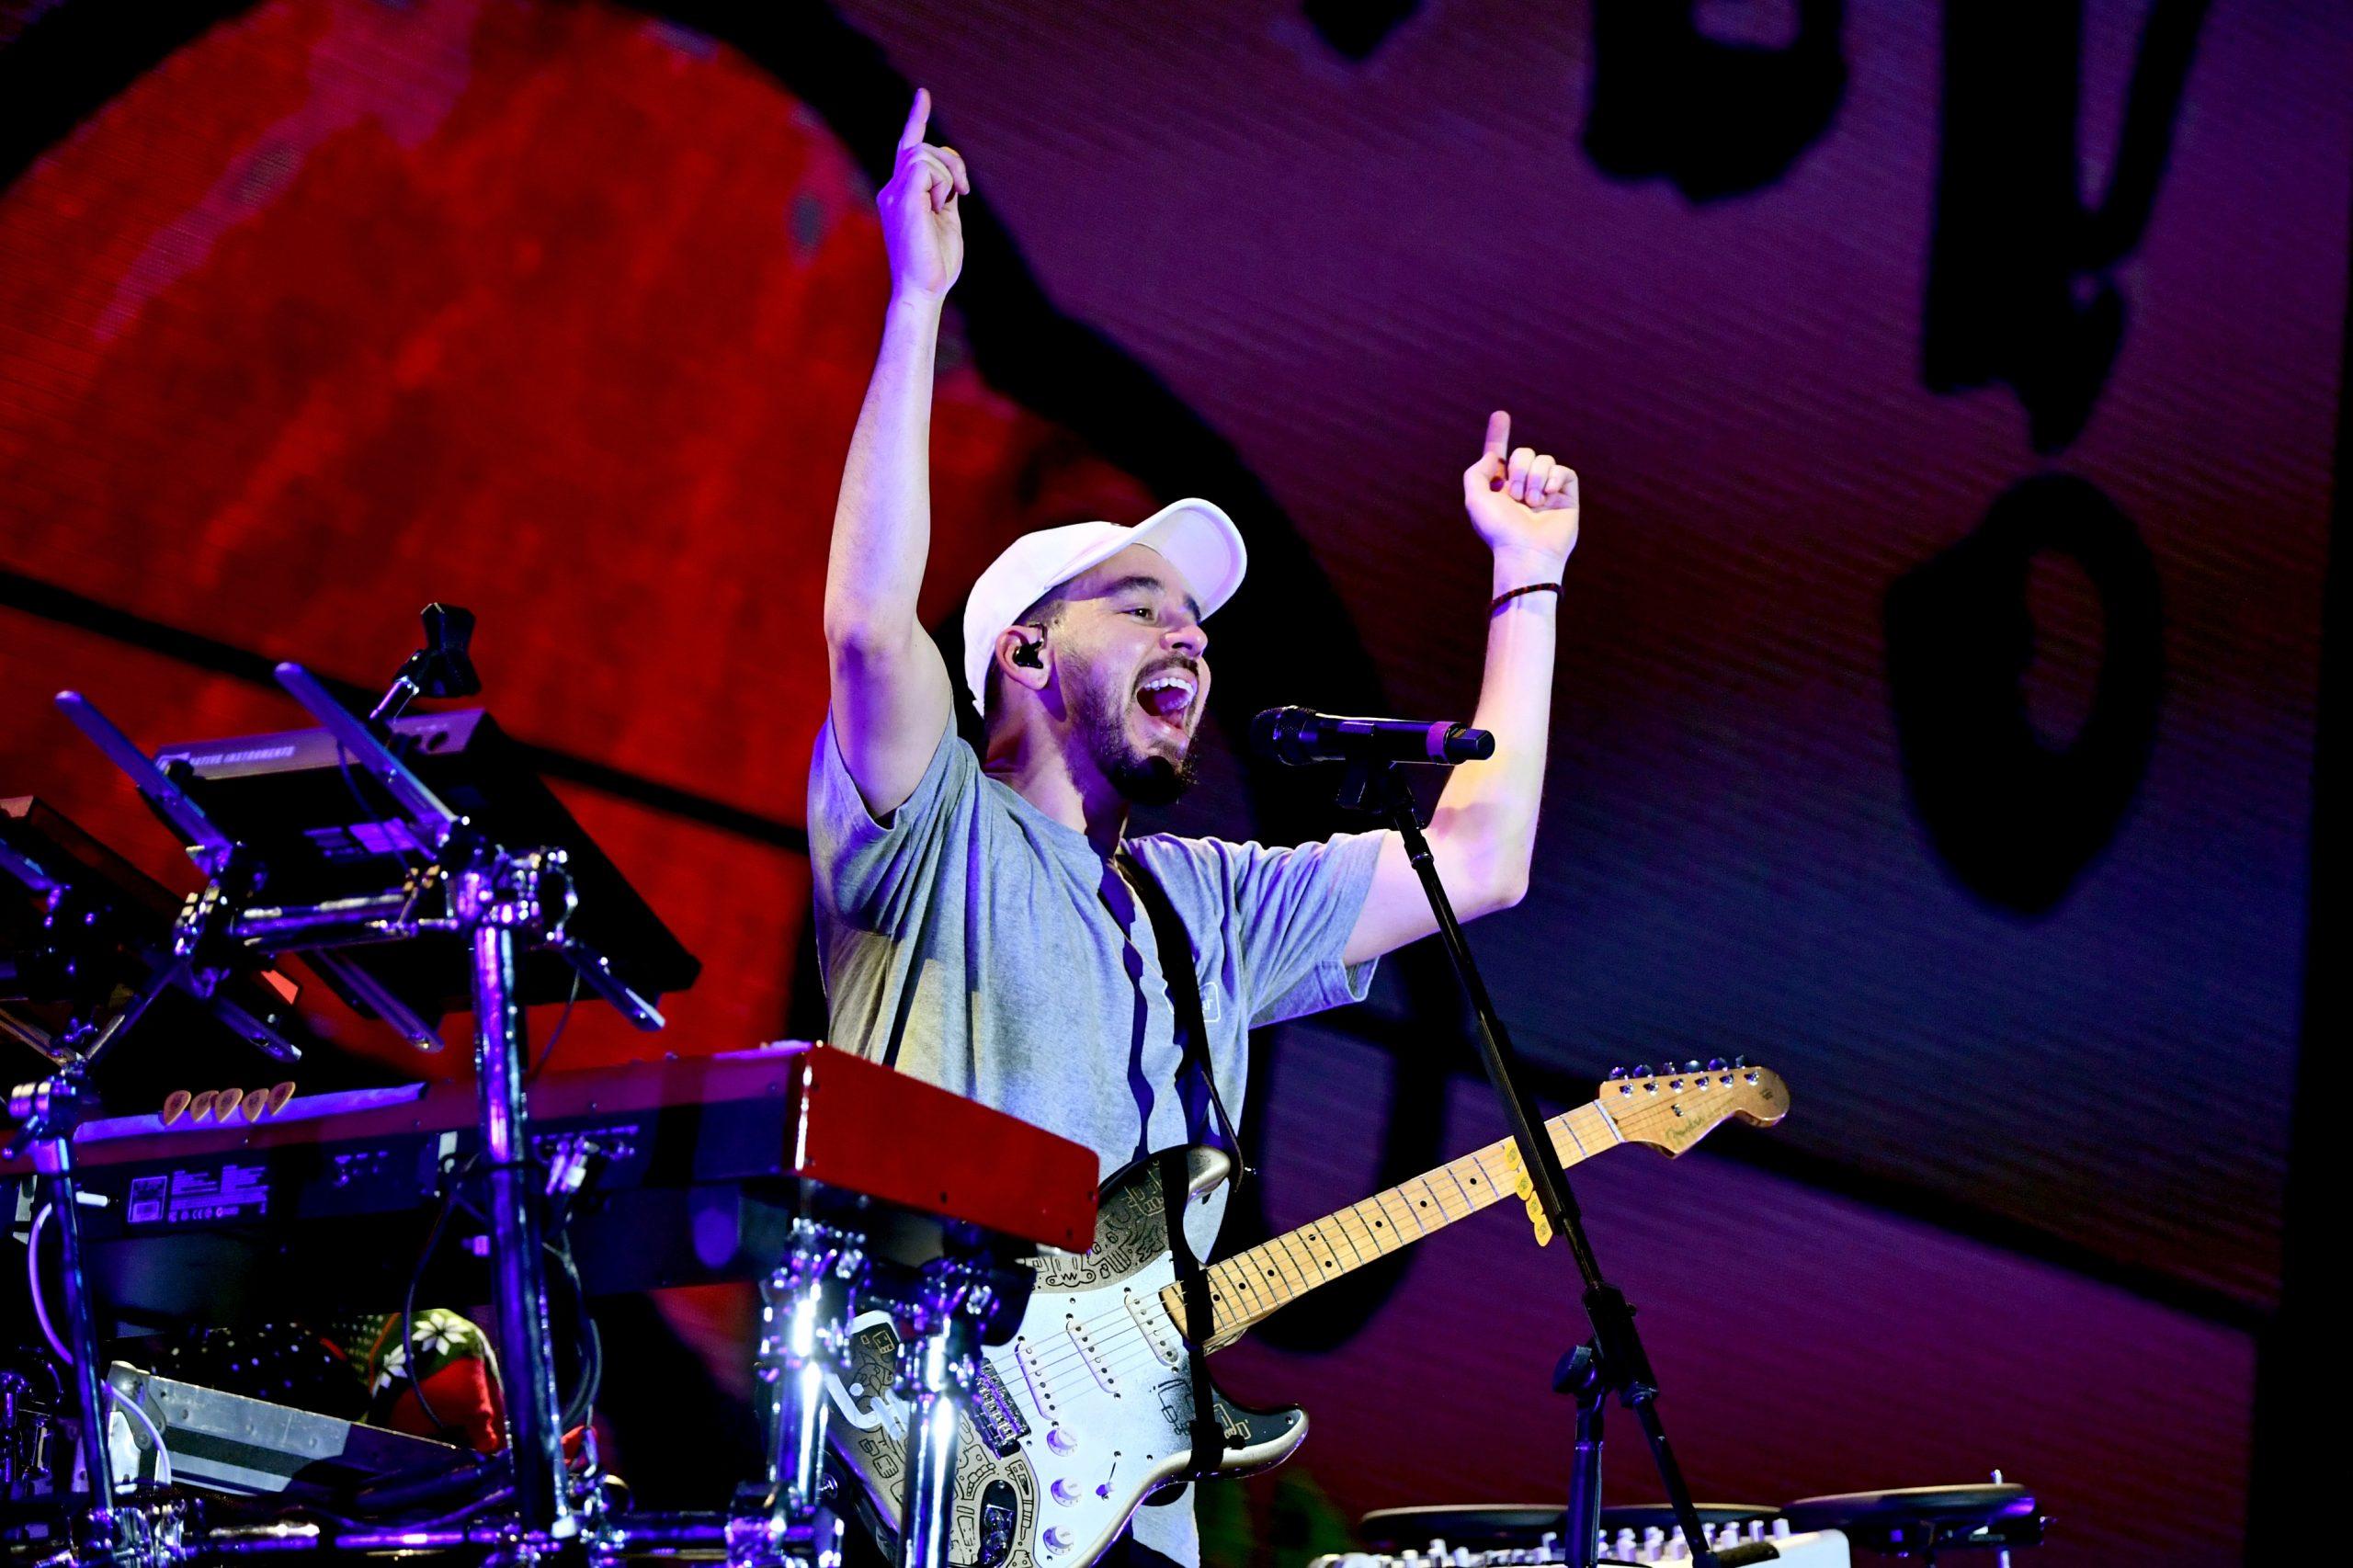 Mike Shinoda de Linkin Park lanzara un disco que compuso en Twitch